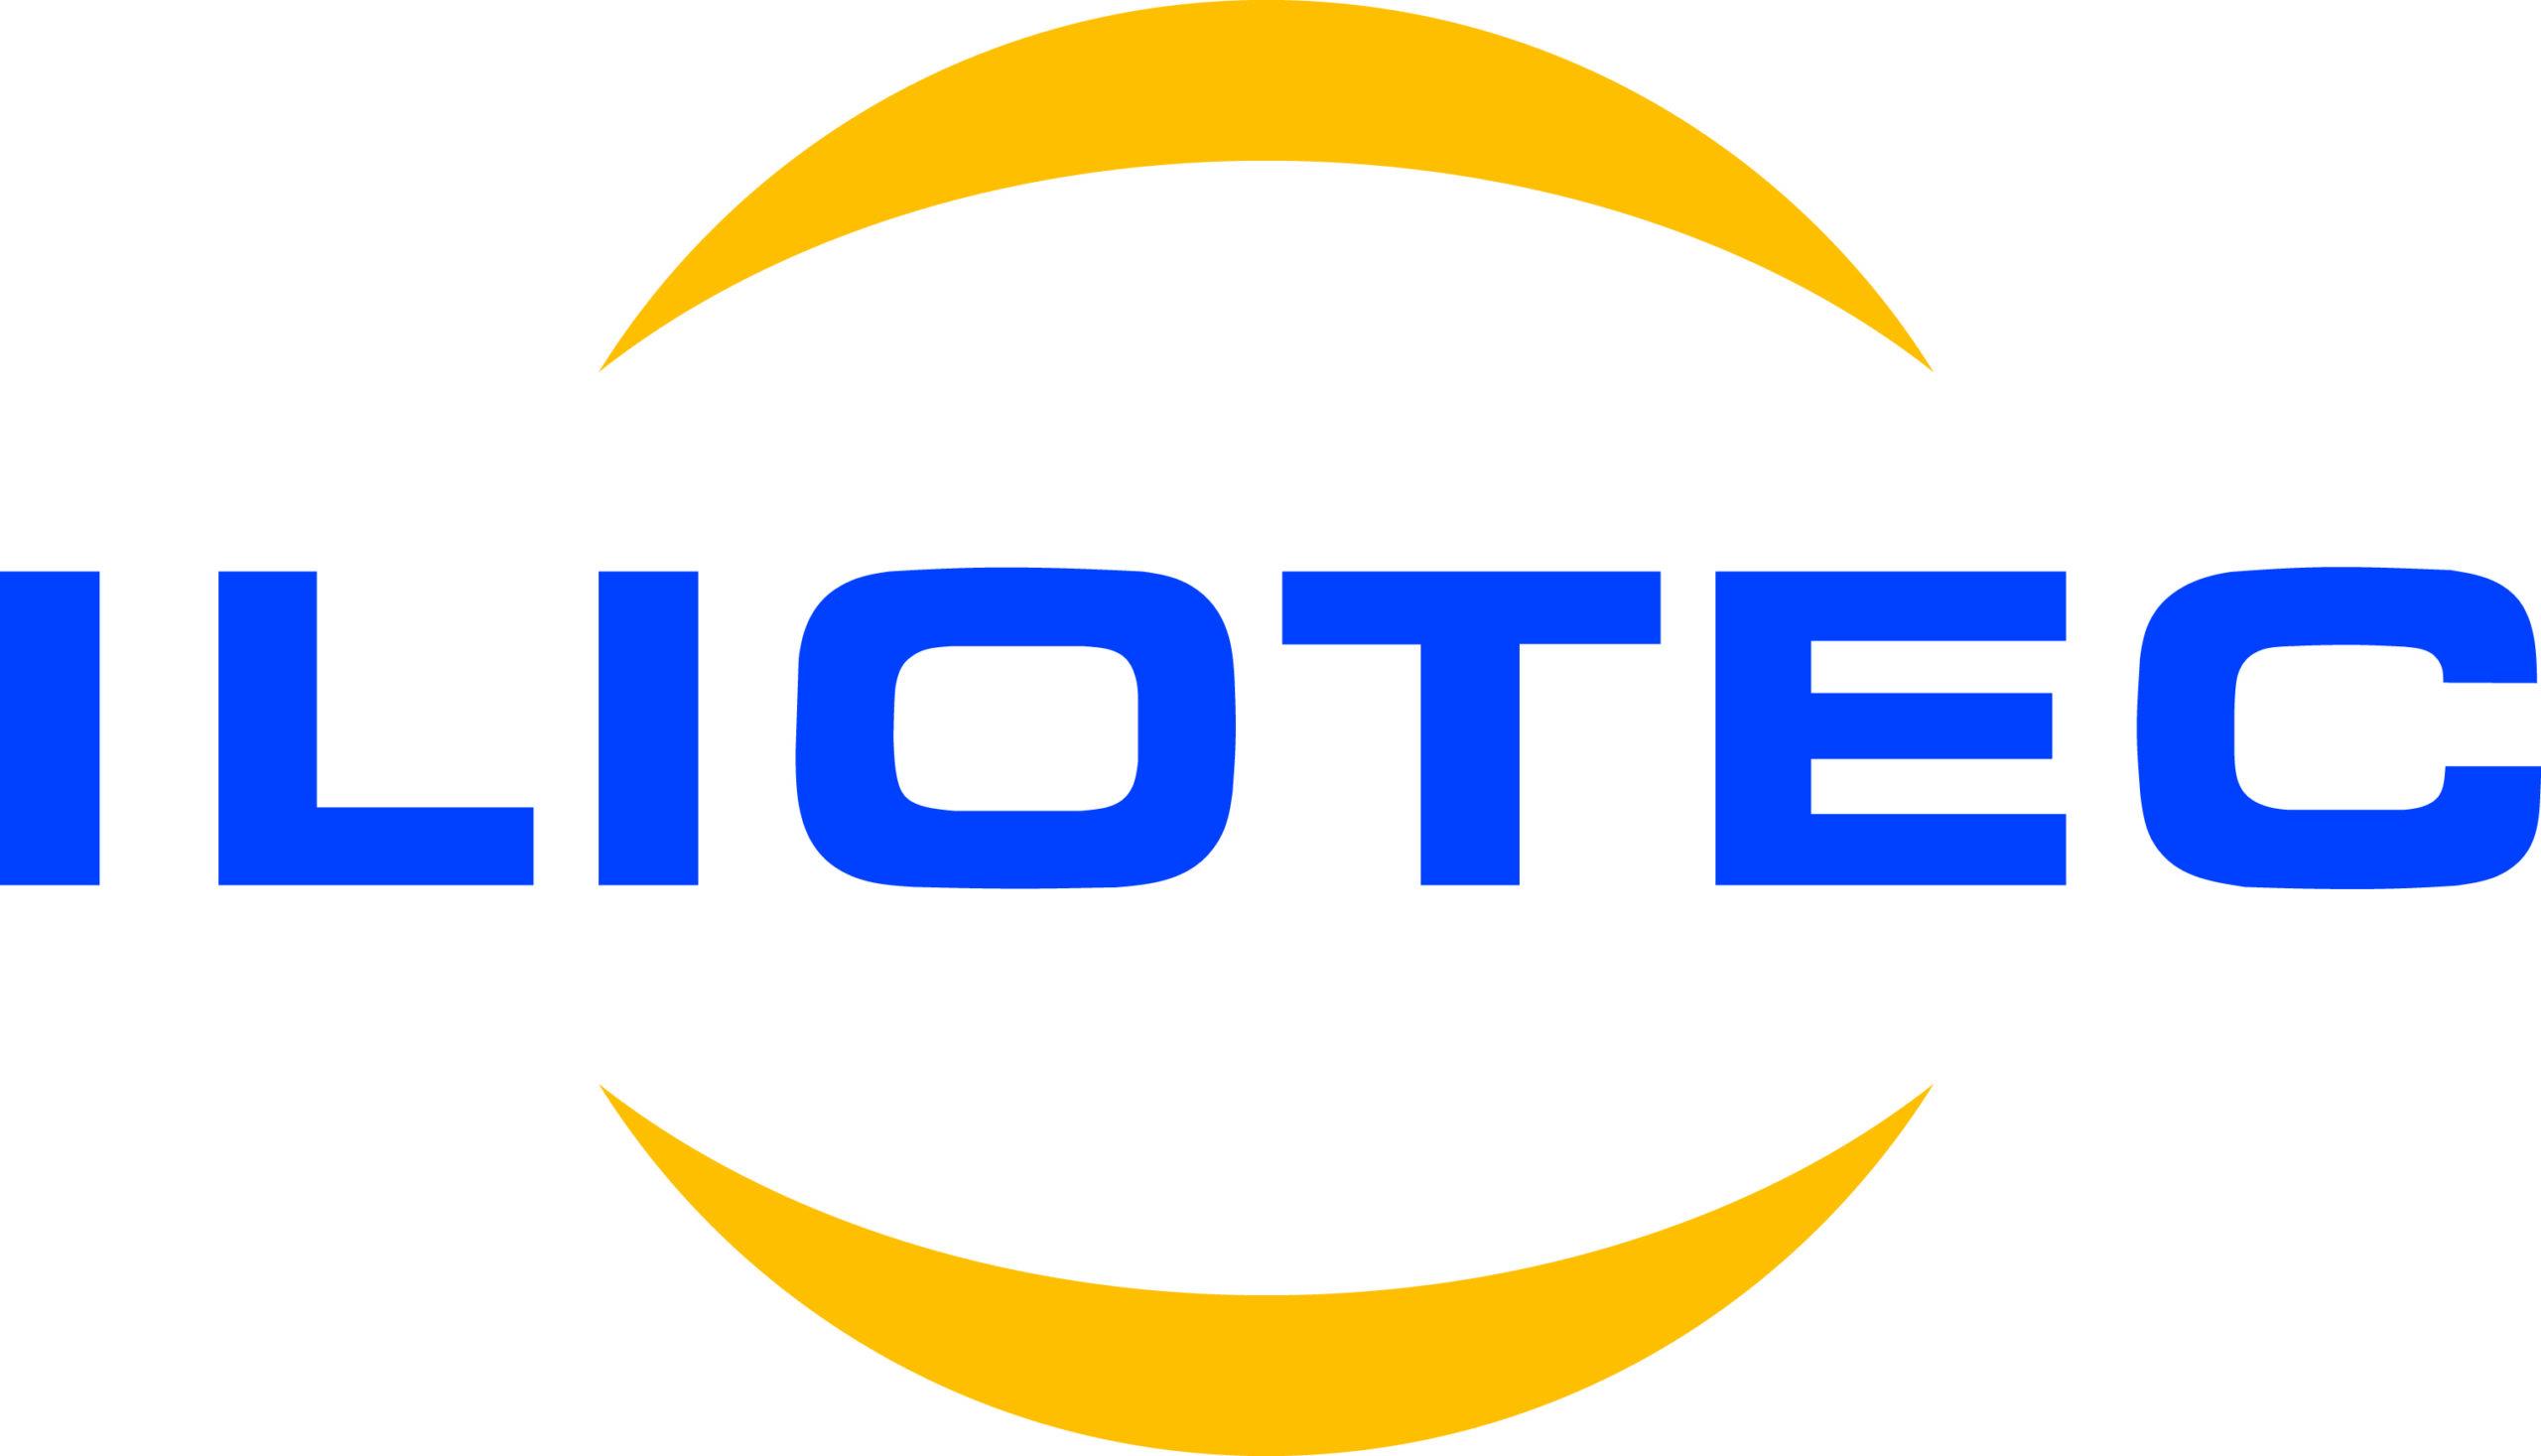 ILIOTEC GmbH